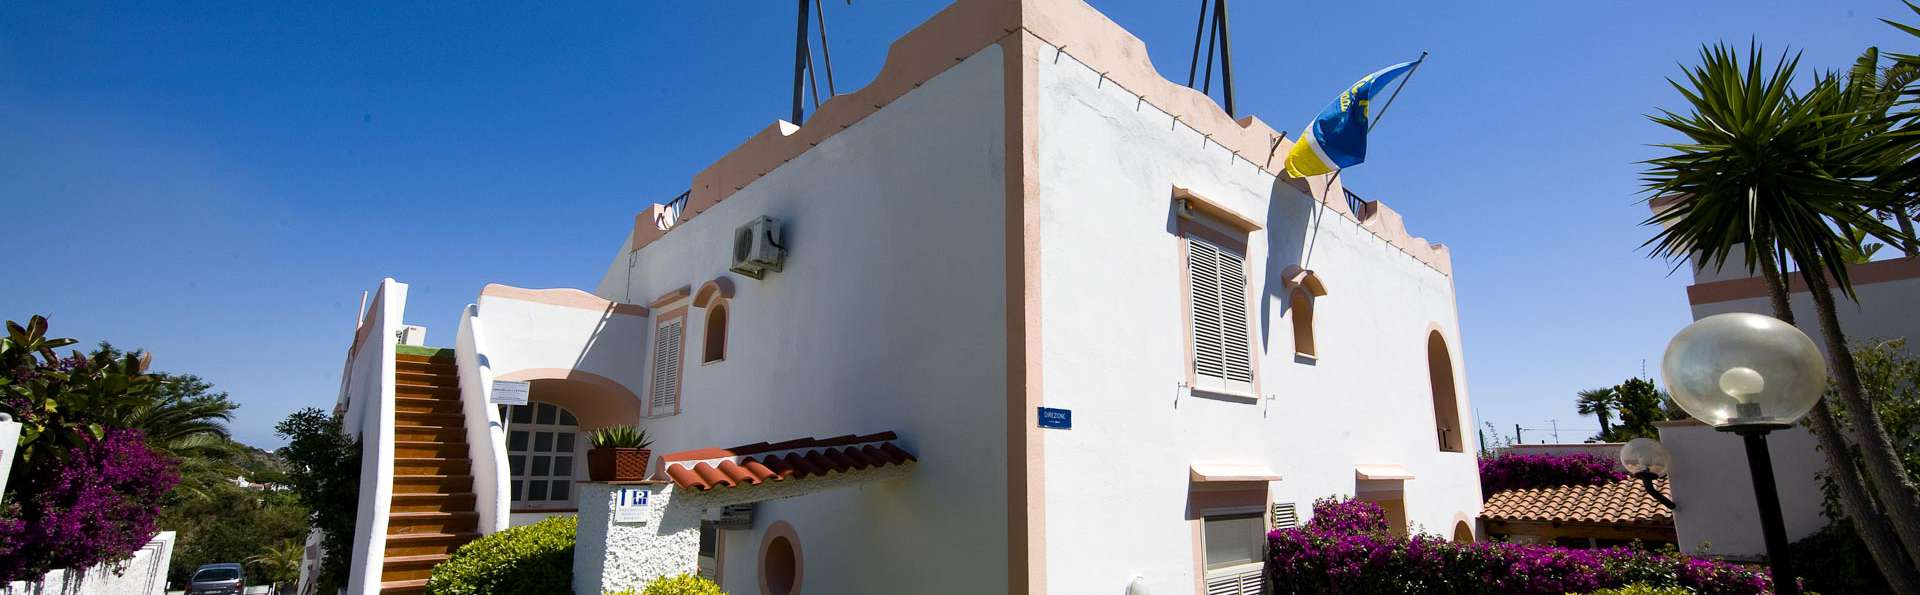 Hotel Castiglione Village - EDIT_FRONT_02.jpg